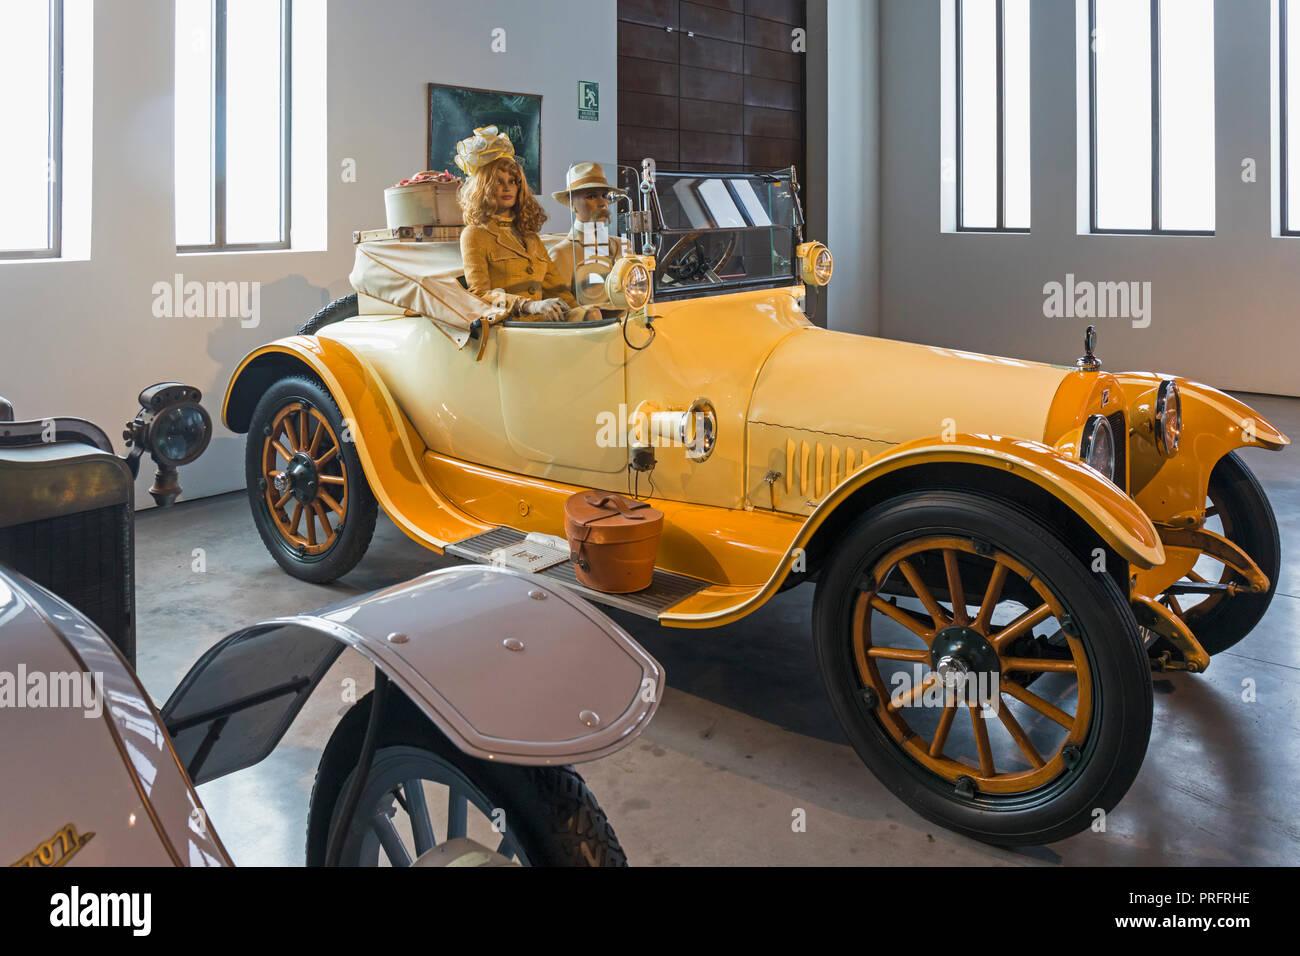 Museo Automovilistico y de la Moda, Malaga, Provinz Malaga, Spanien. Automobil und Mode Museum. 6-Zylinder, 45 PS, 3700 cm³-Modell D 44 amerikanische Bui Stockbild